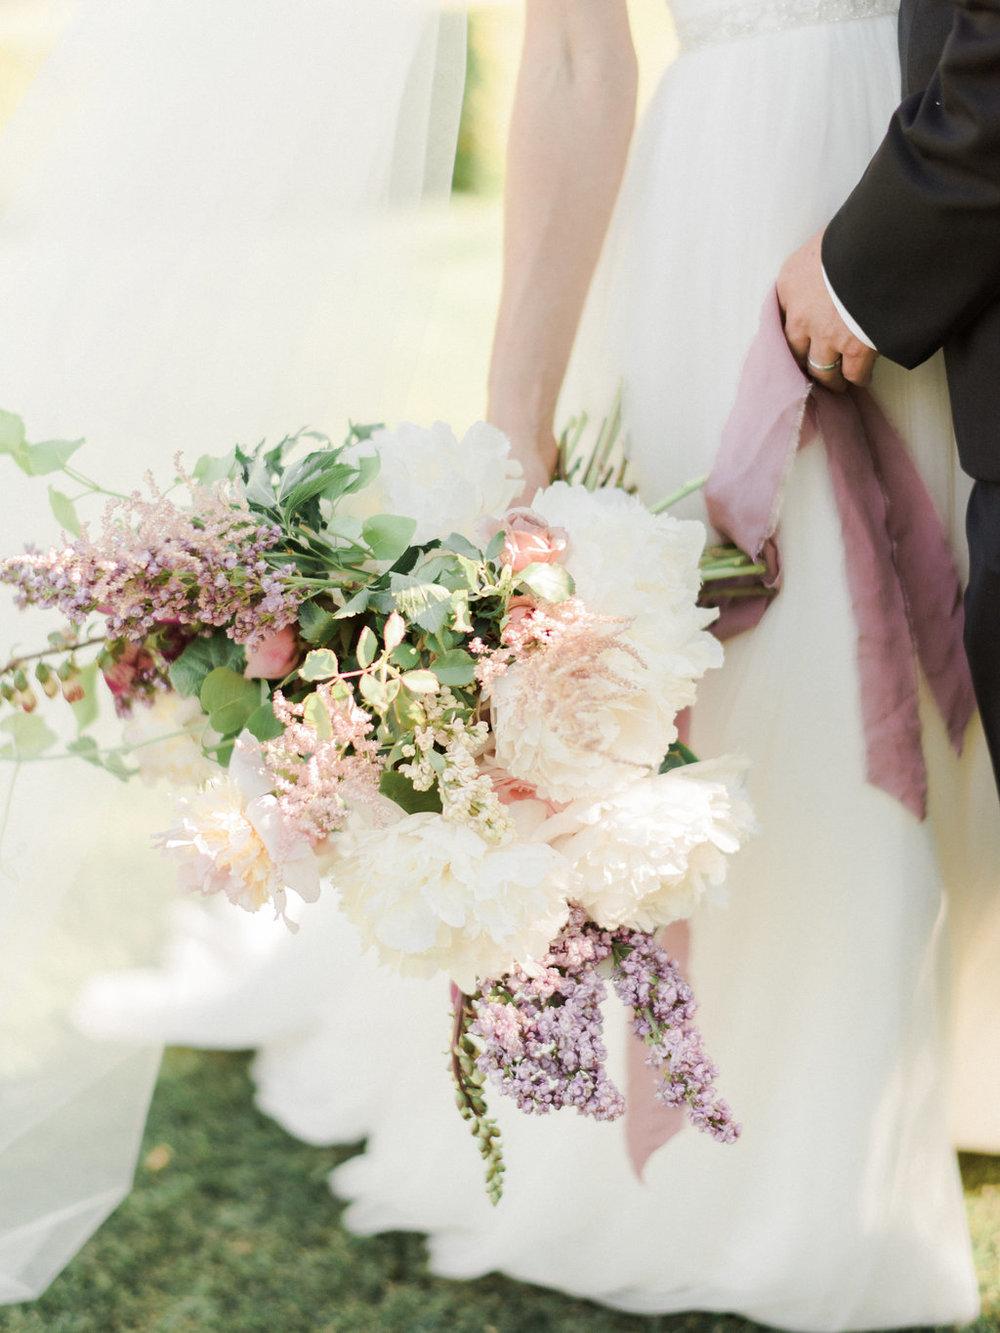 linajaandmichael-wedding-790.jpg